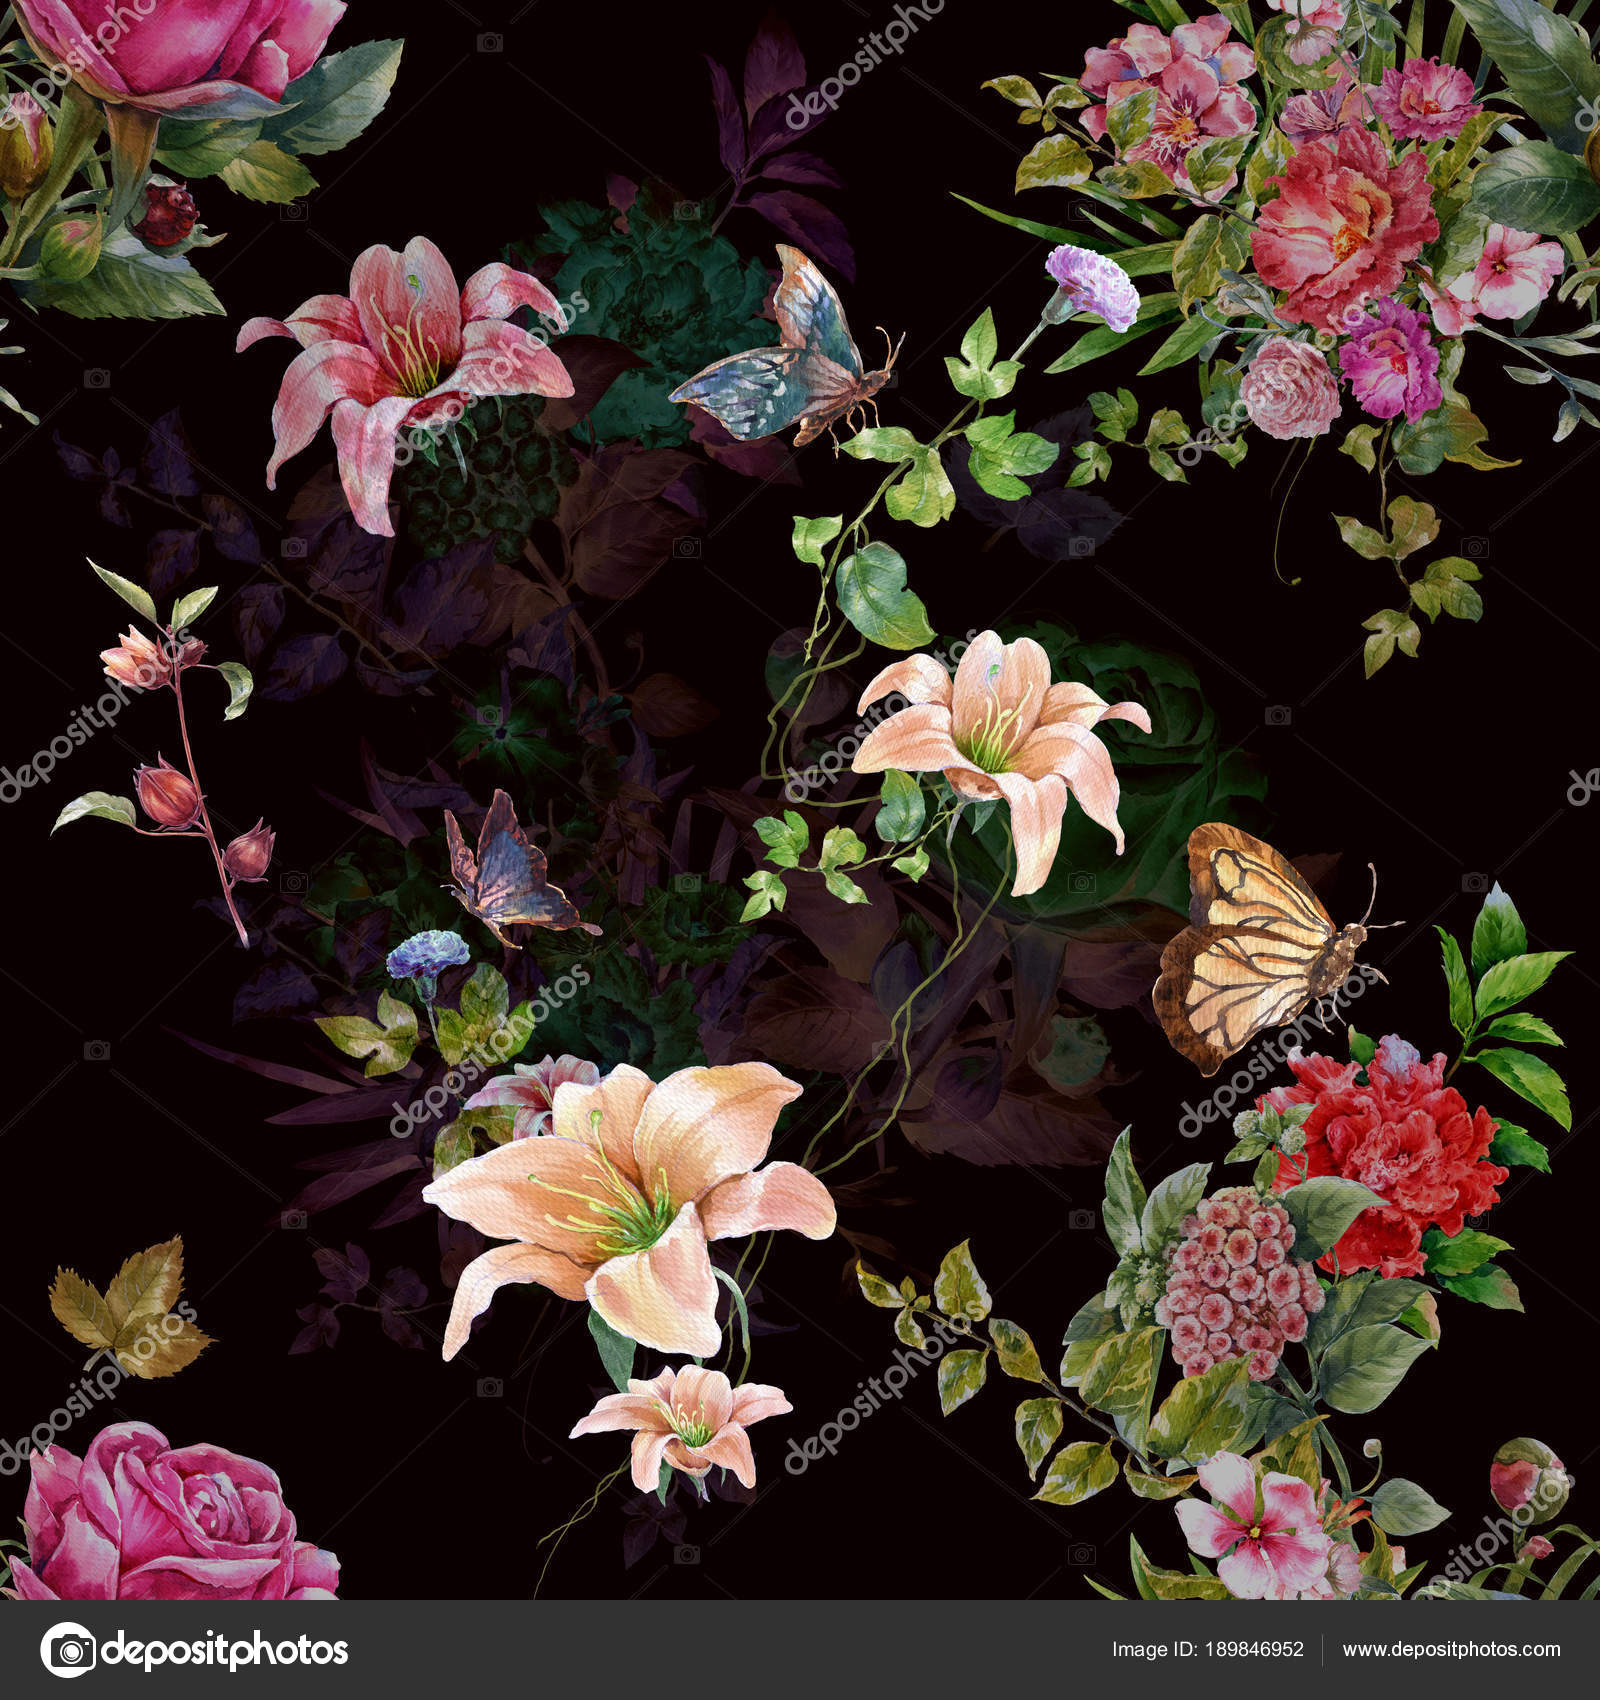 Watercolor Painting Leaf Flowers Seamless Pattern Dark Background